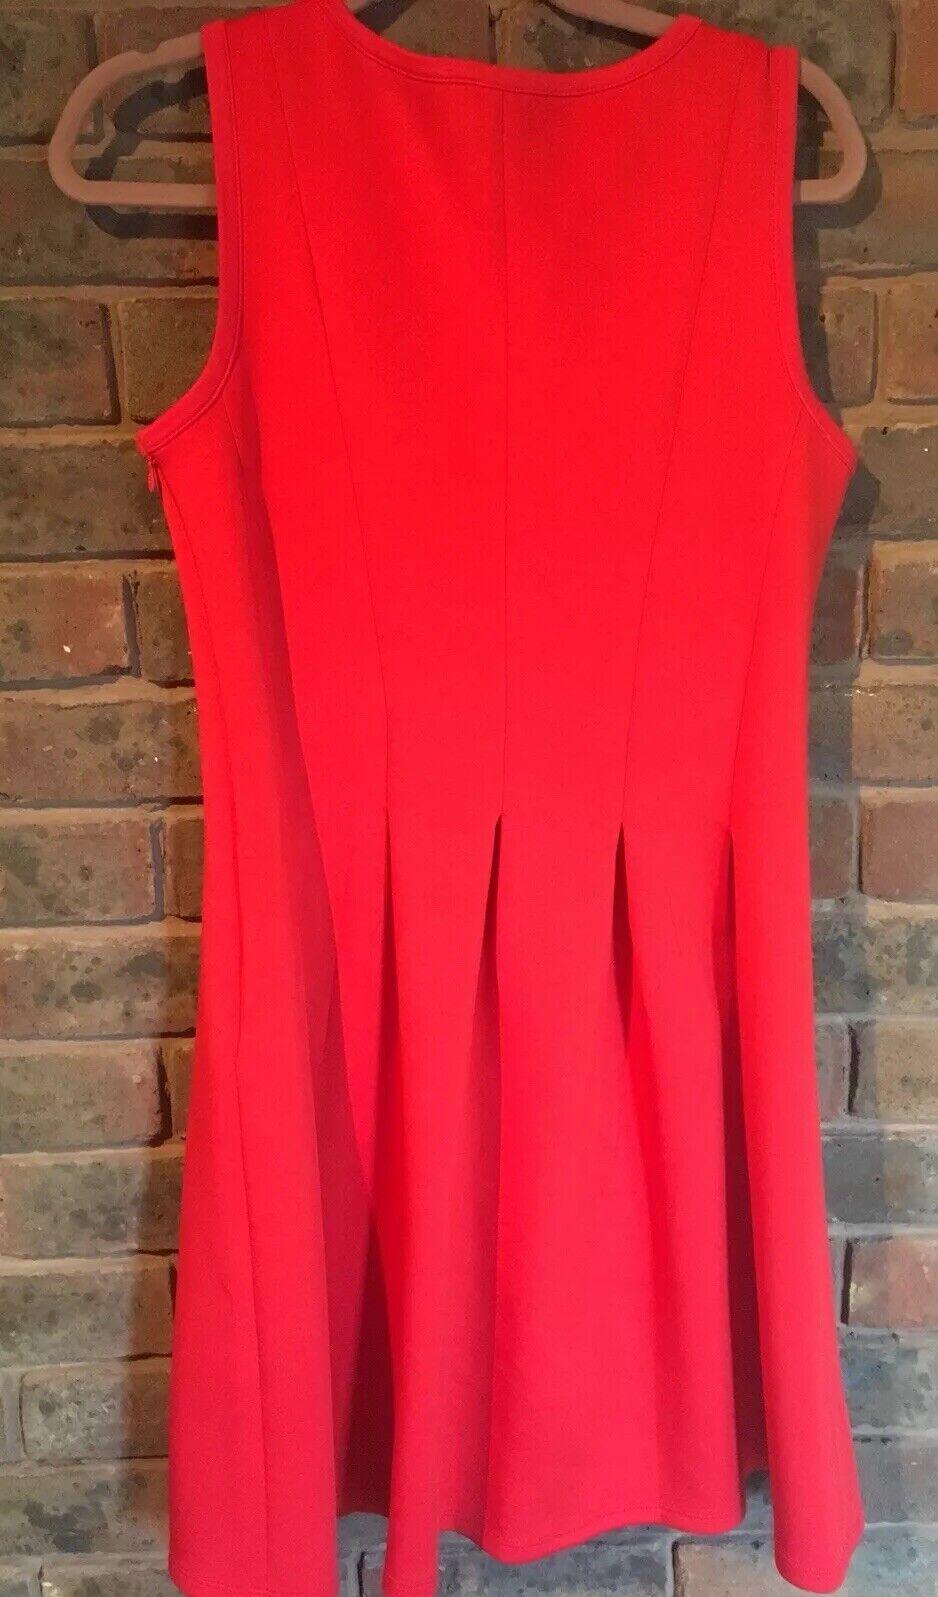 67a4dabd20d0 ... Ann taylor taylor taylor Womens Red Short Dress US8 UK12 d27a07 ...